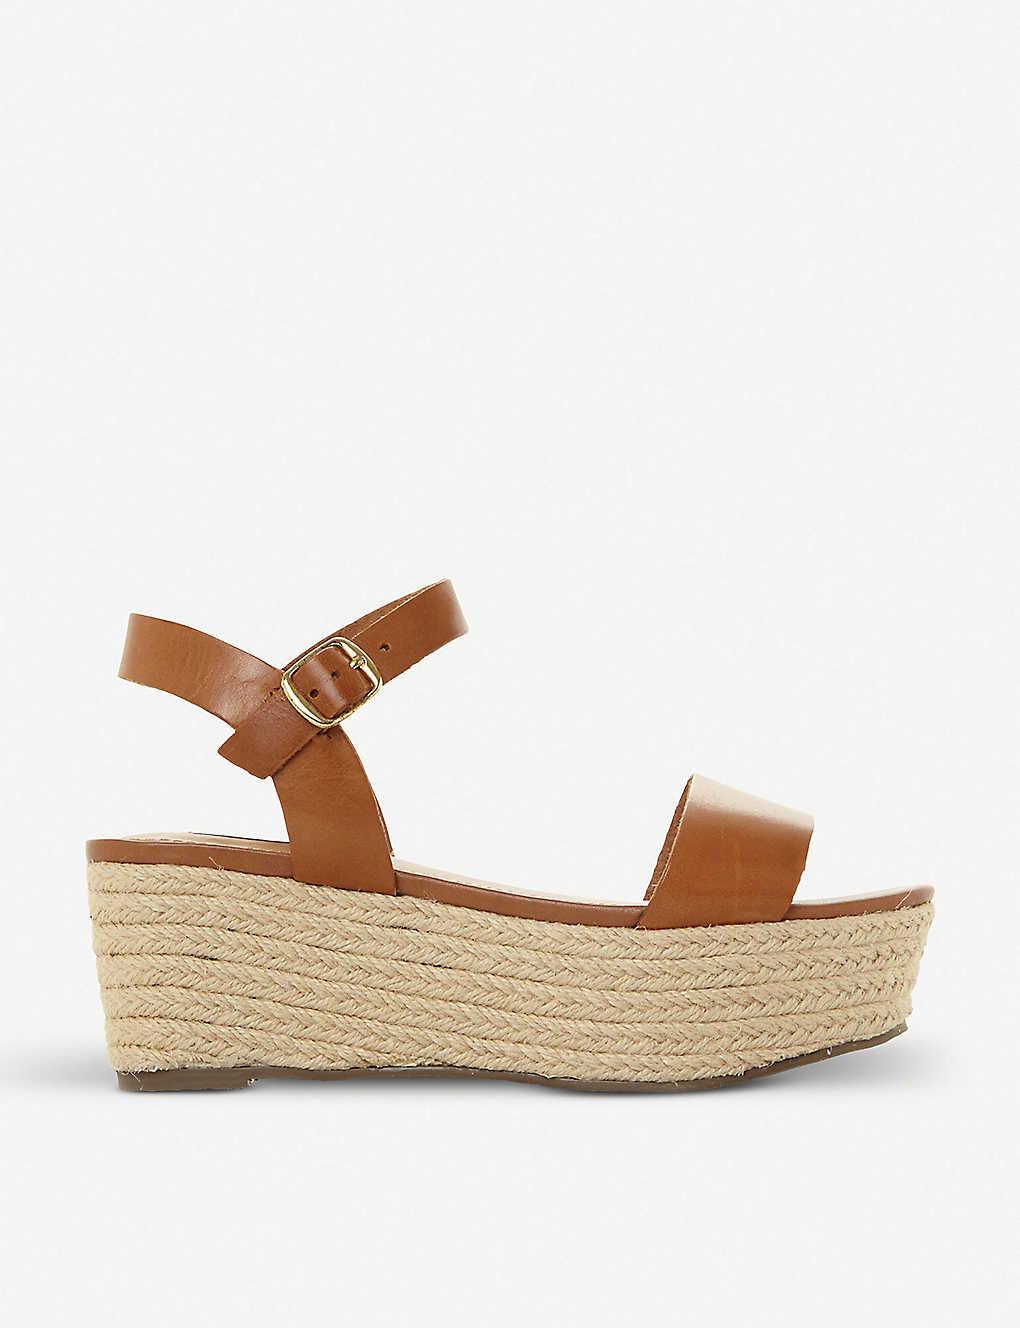 STEVE MADDEN Busy SM leather and jute platform sandals LISFHT